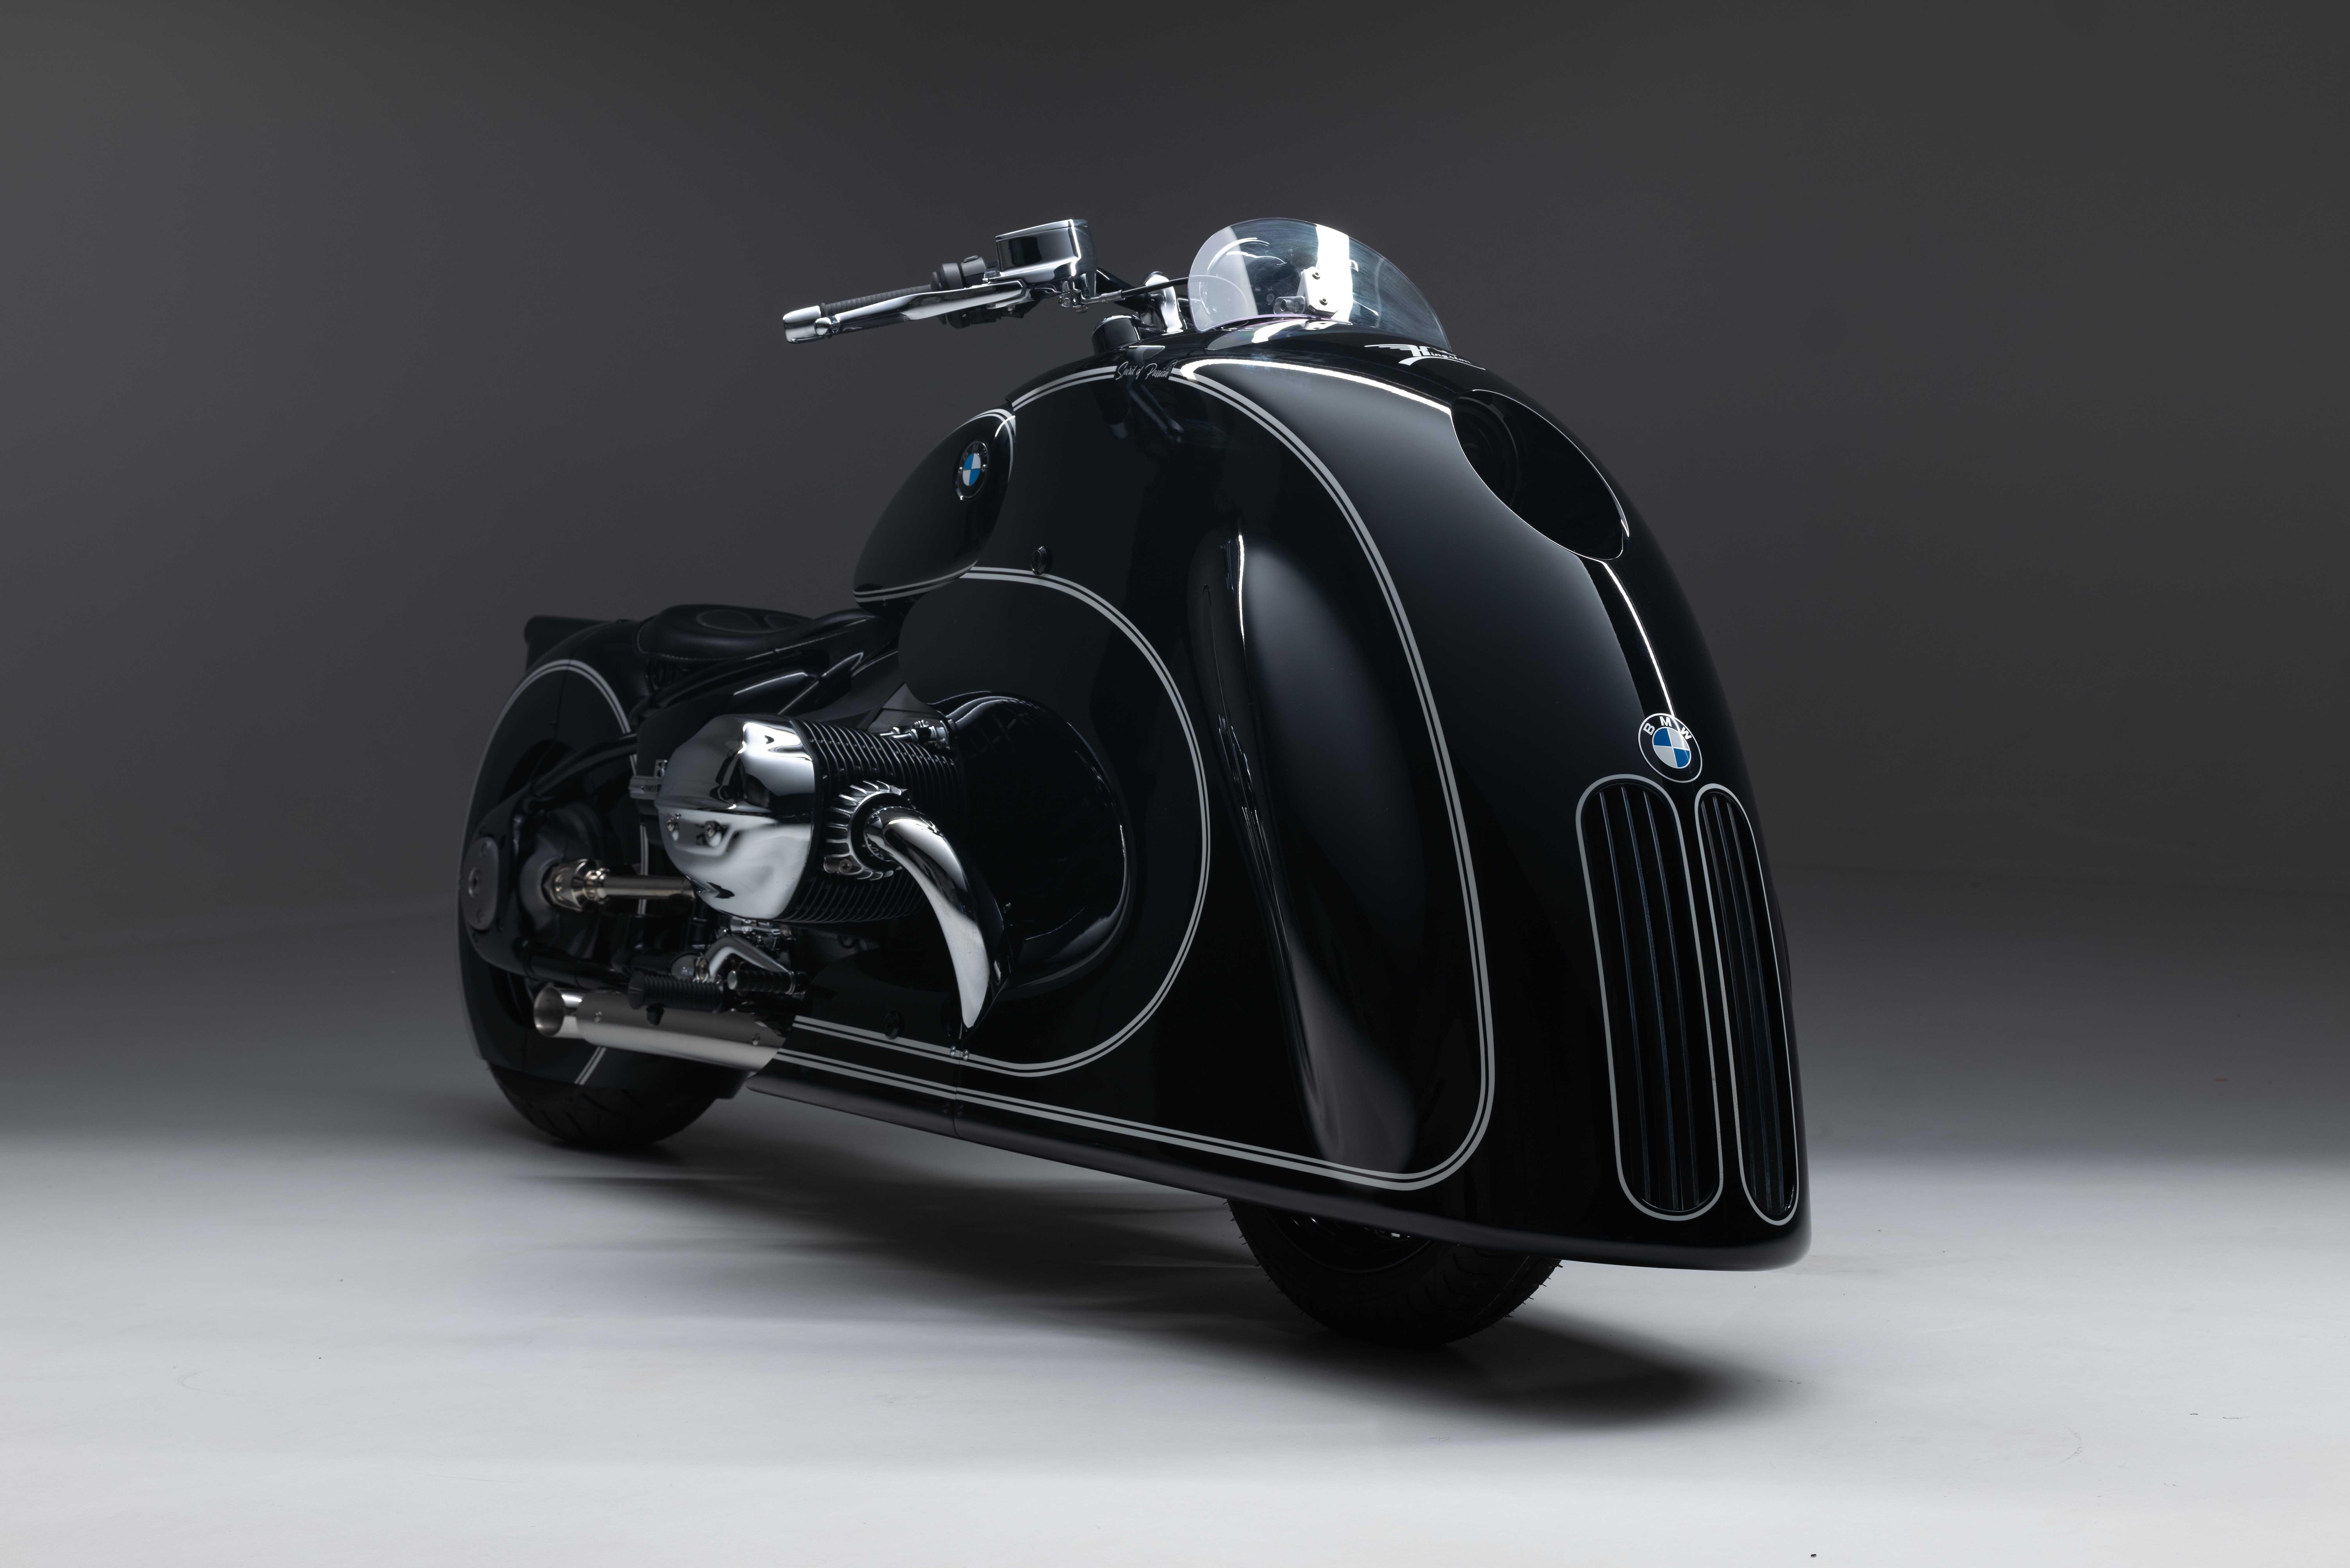 R 18 Custom Bike, una moto para villanos